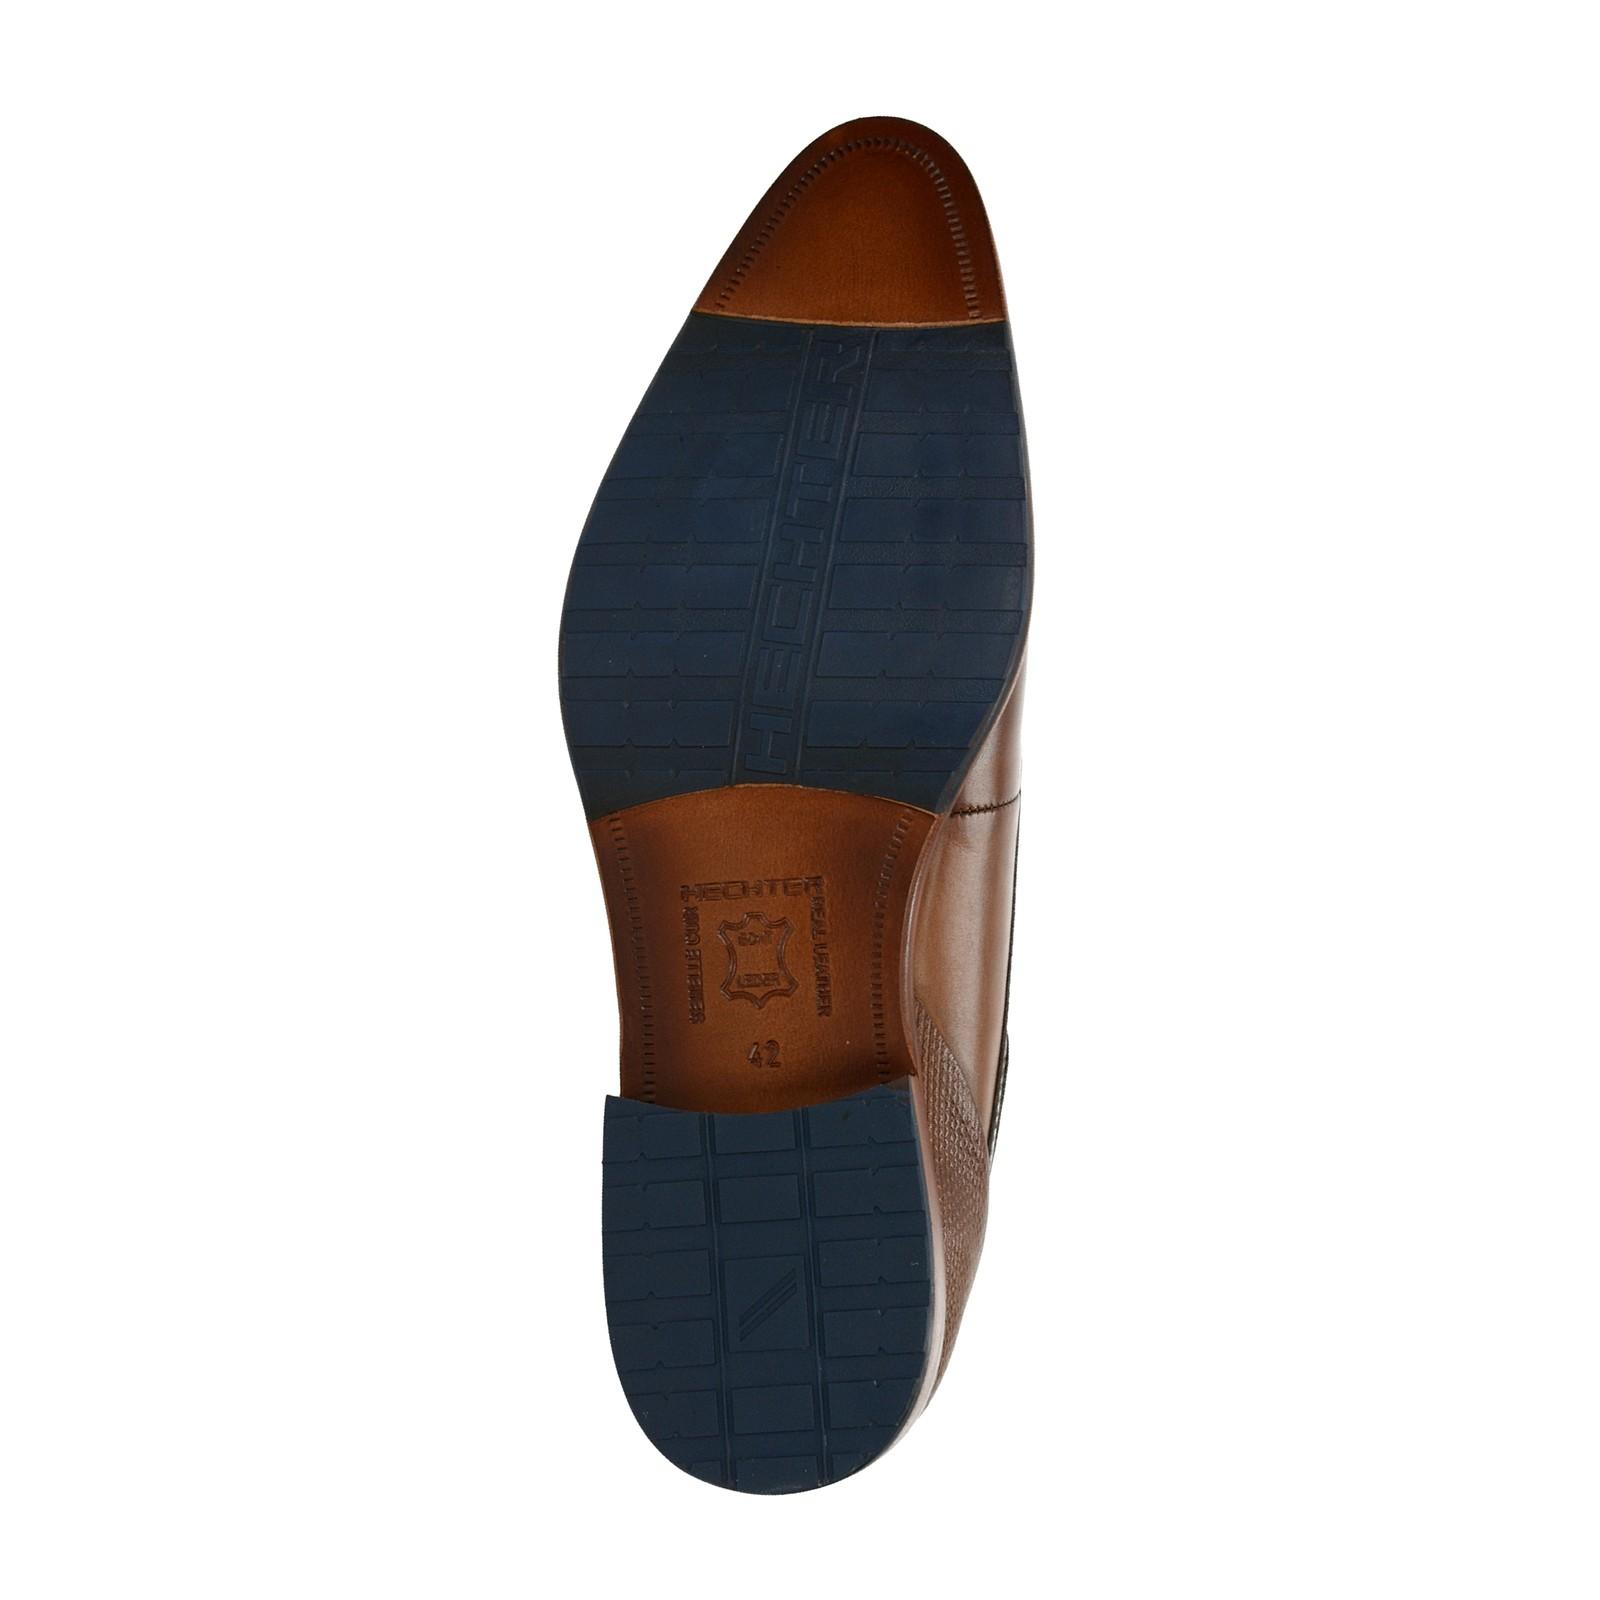 dbccfafa0876 ... Daniel Hechter pánske kožené spoločenské topánky - koňakové ...